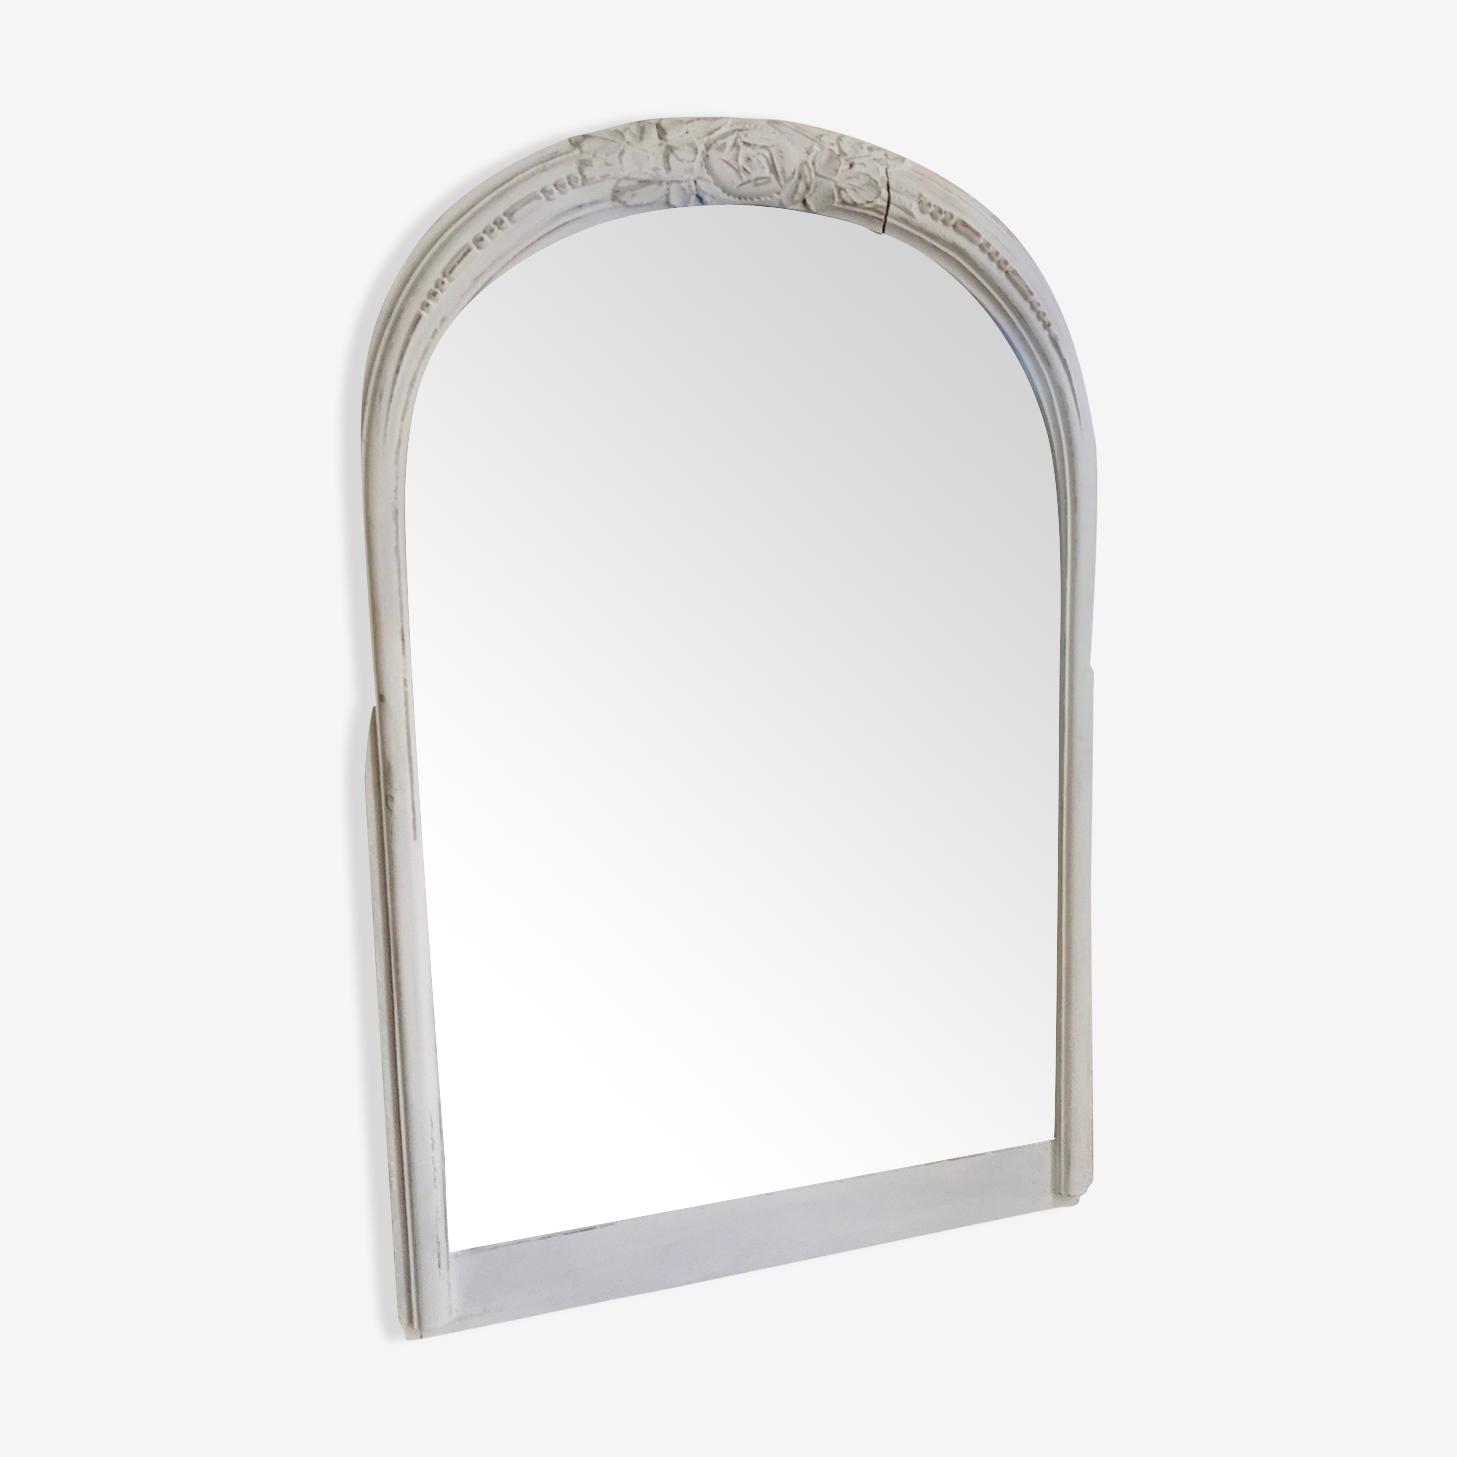 Big old mirror patina white shabby chic 61x81cm